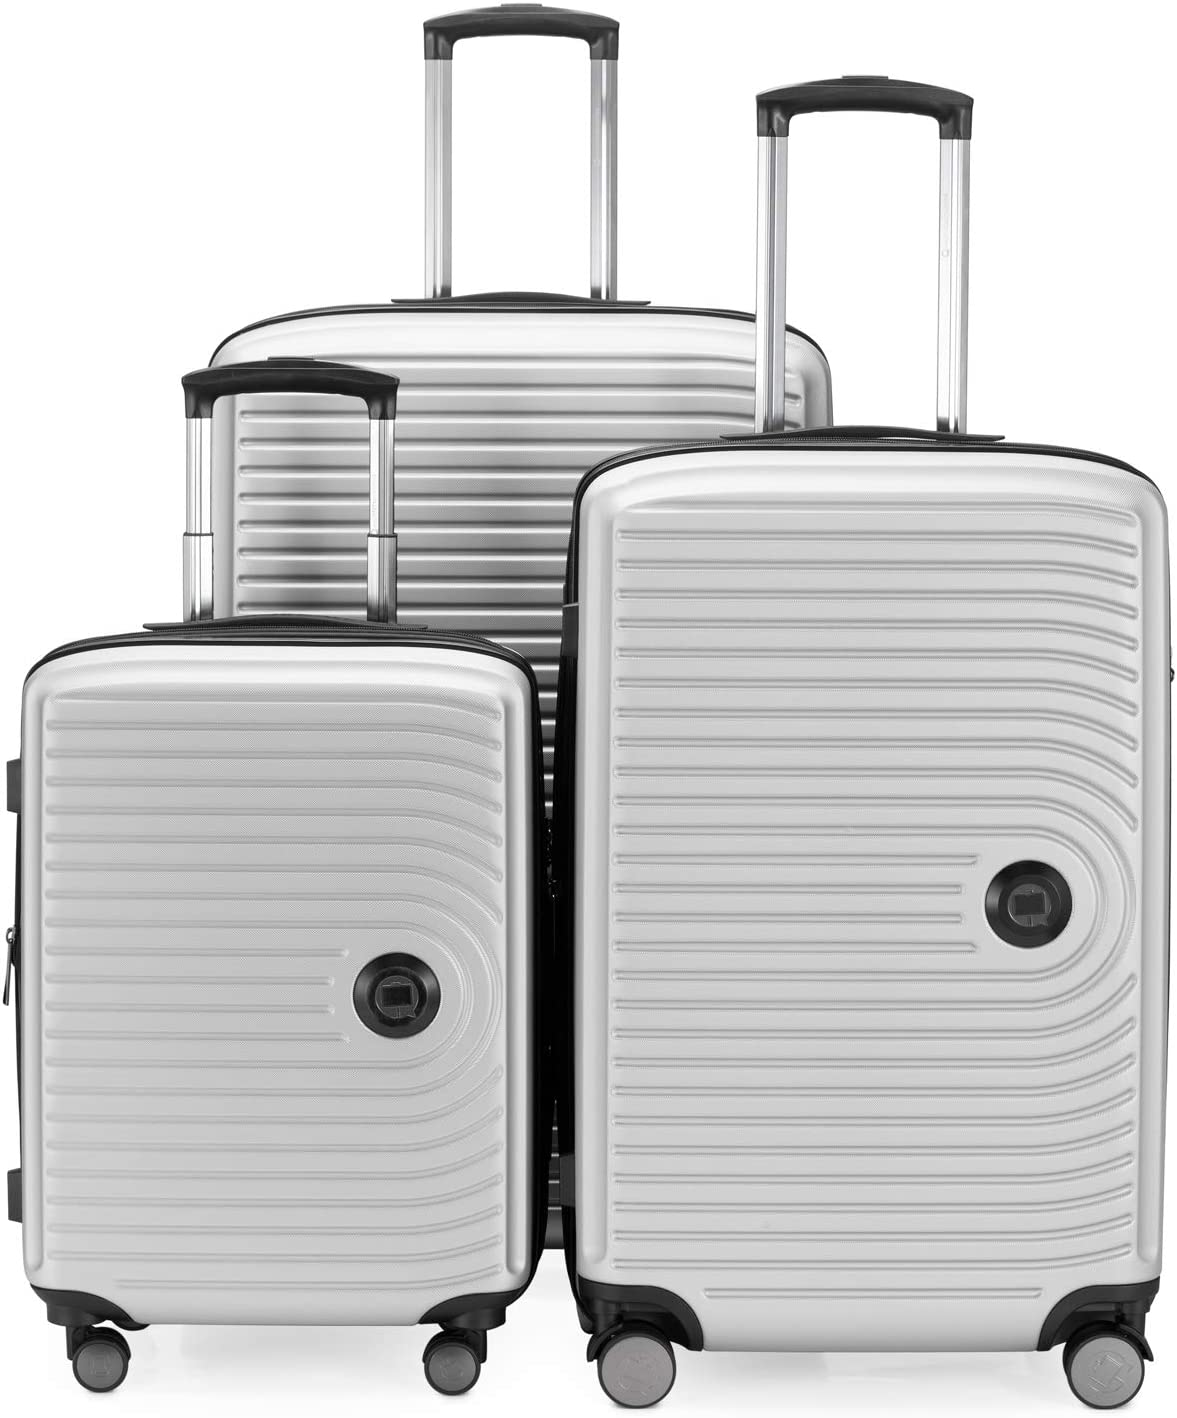 HAUPTSTADTKOFFER - Juego de 3 maletas extensibles – Trolley cabina de de 55 cm, Equipaje de tamaño mediano 68 cm + maleta grande para viaje 77 cm, cáscara dura ABS, TSA, Blanco